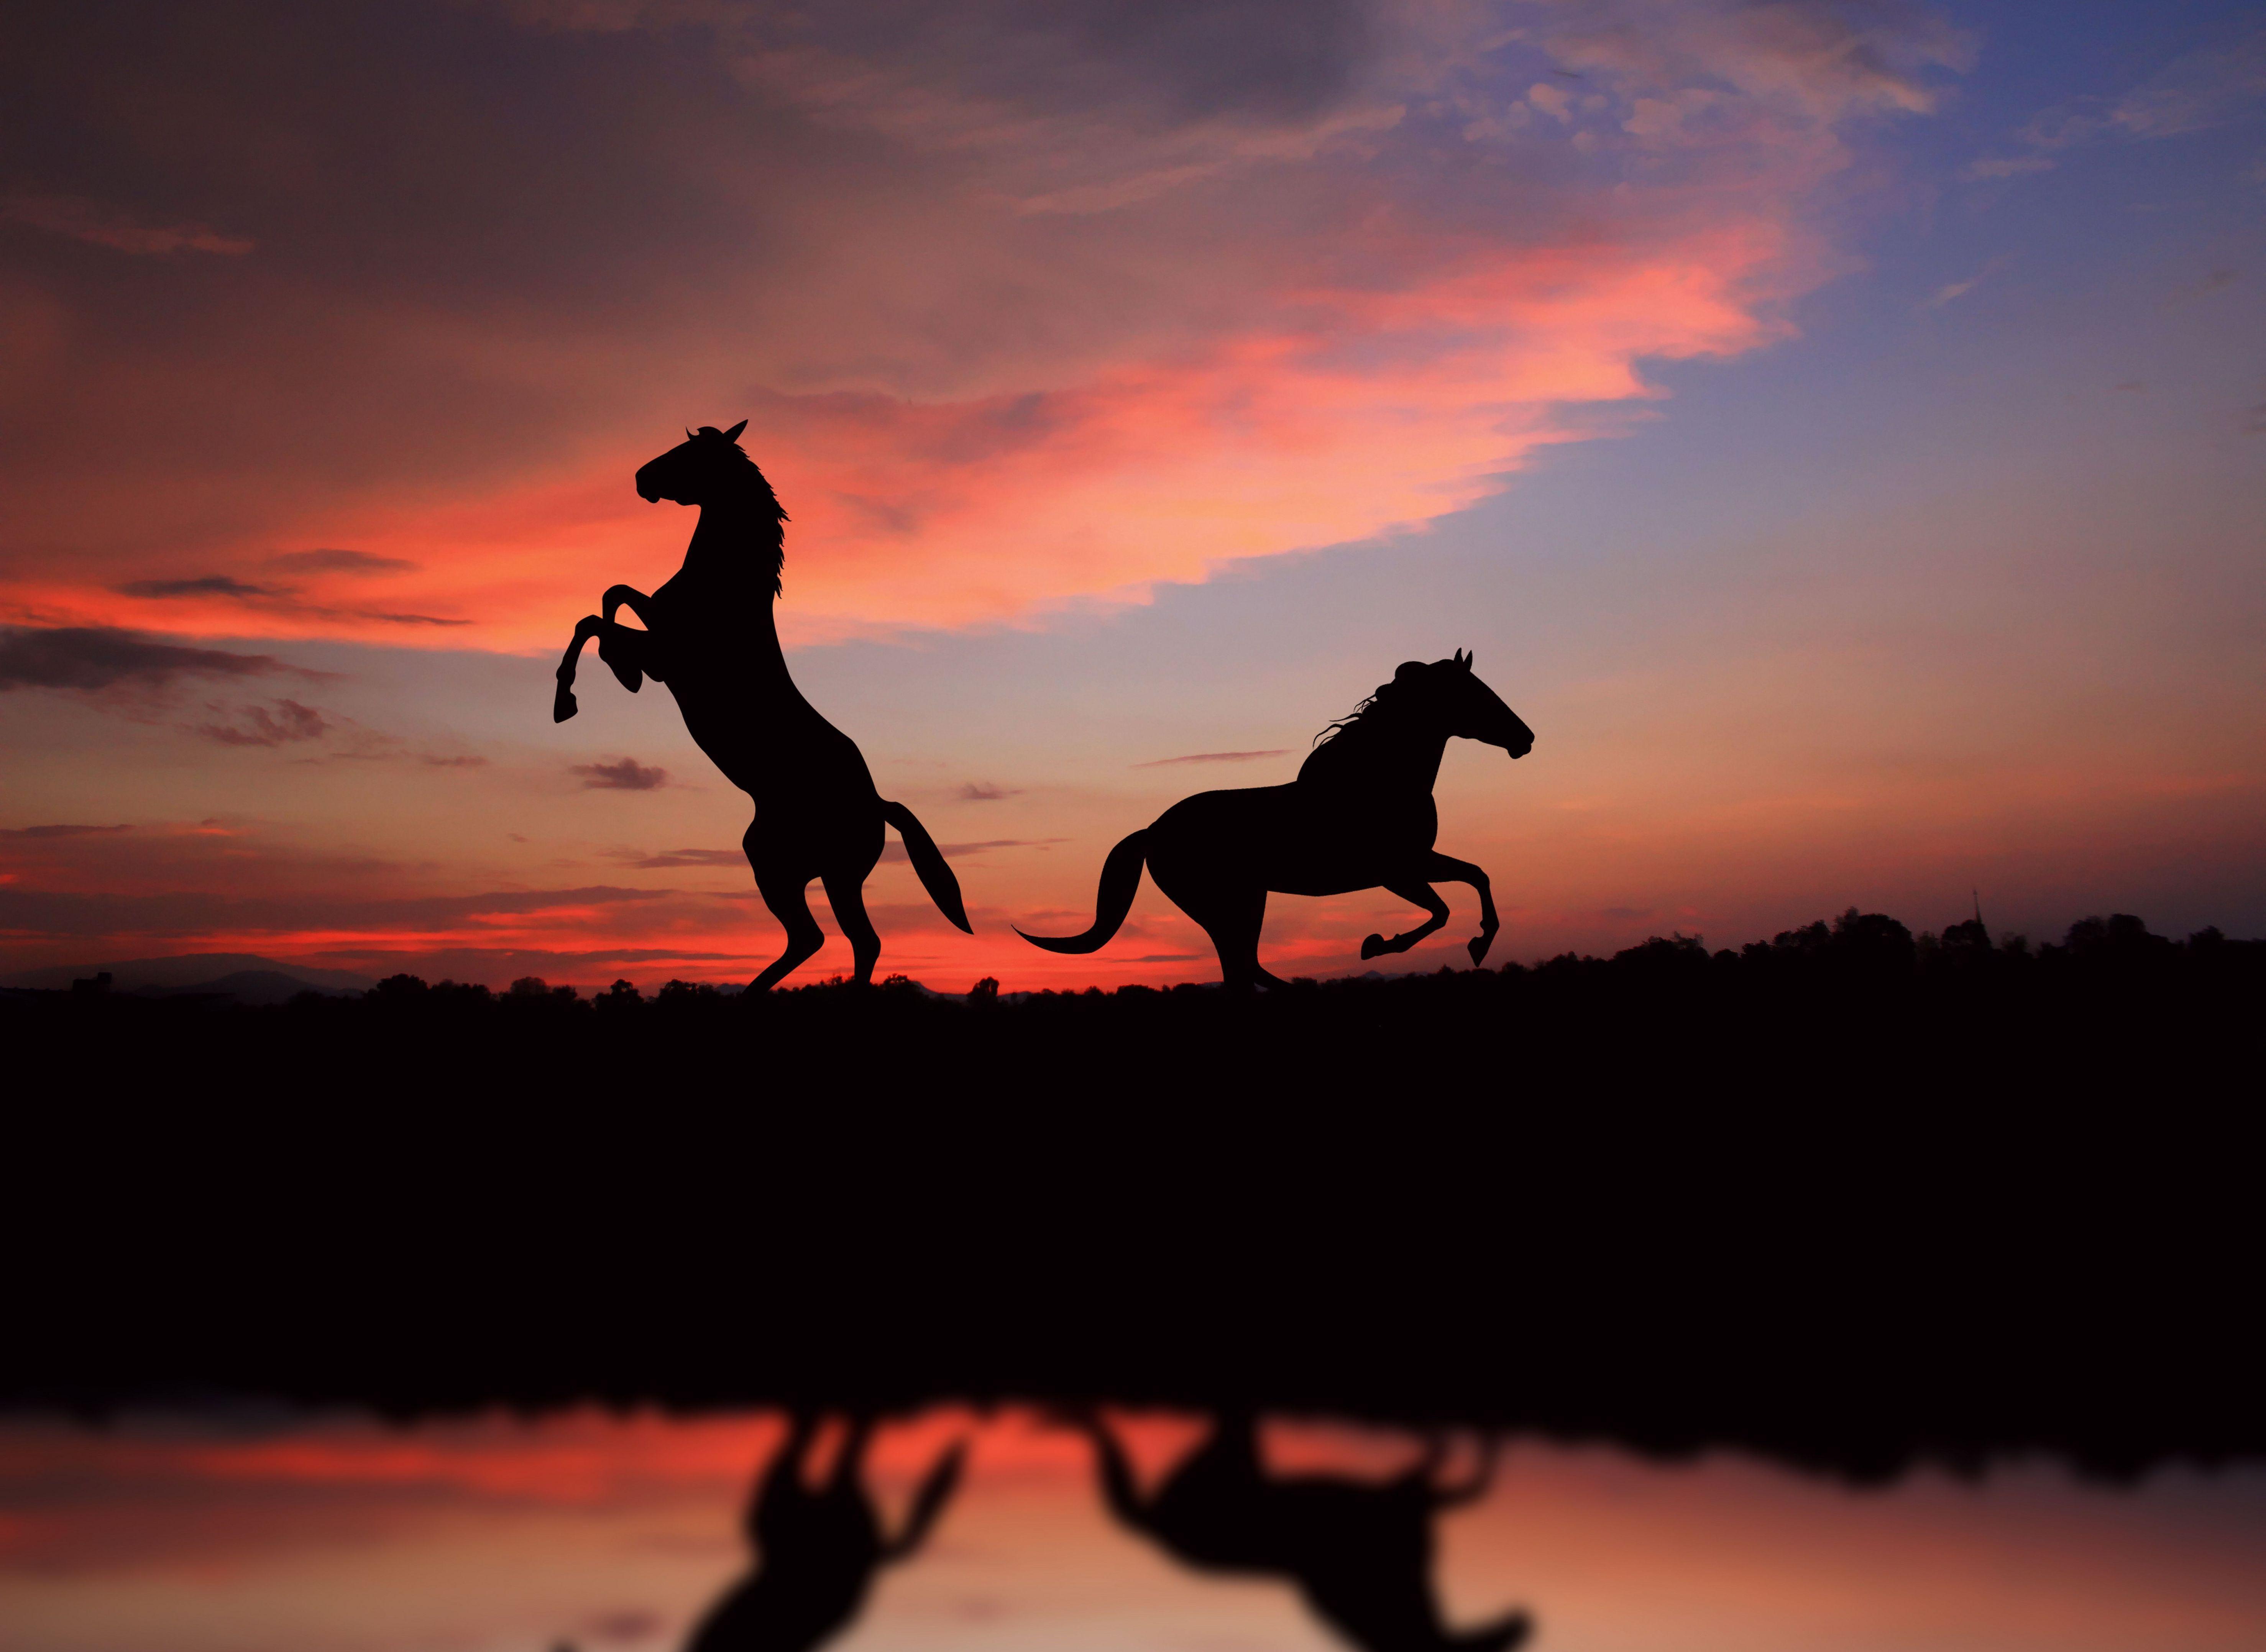 Wild Horses On The Beach At Sunset 01